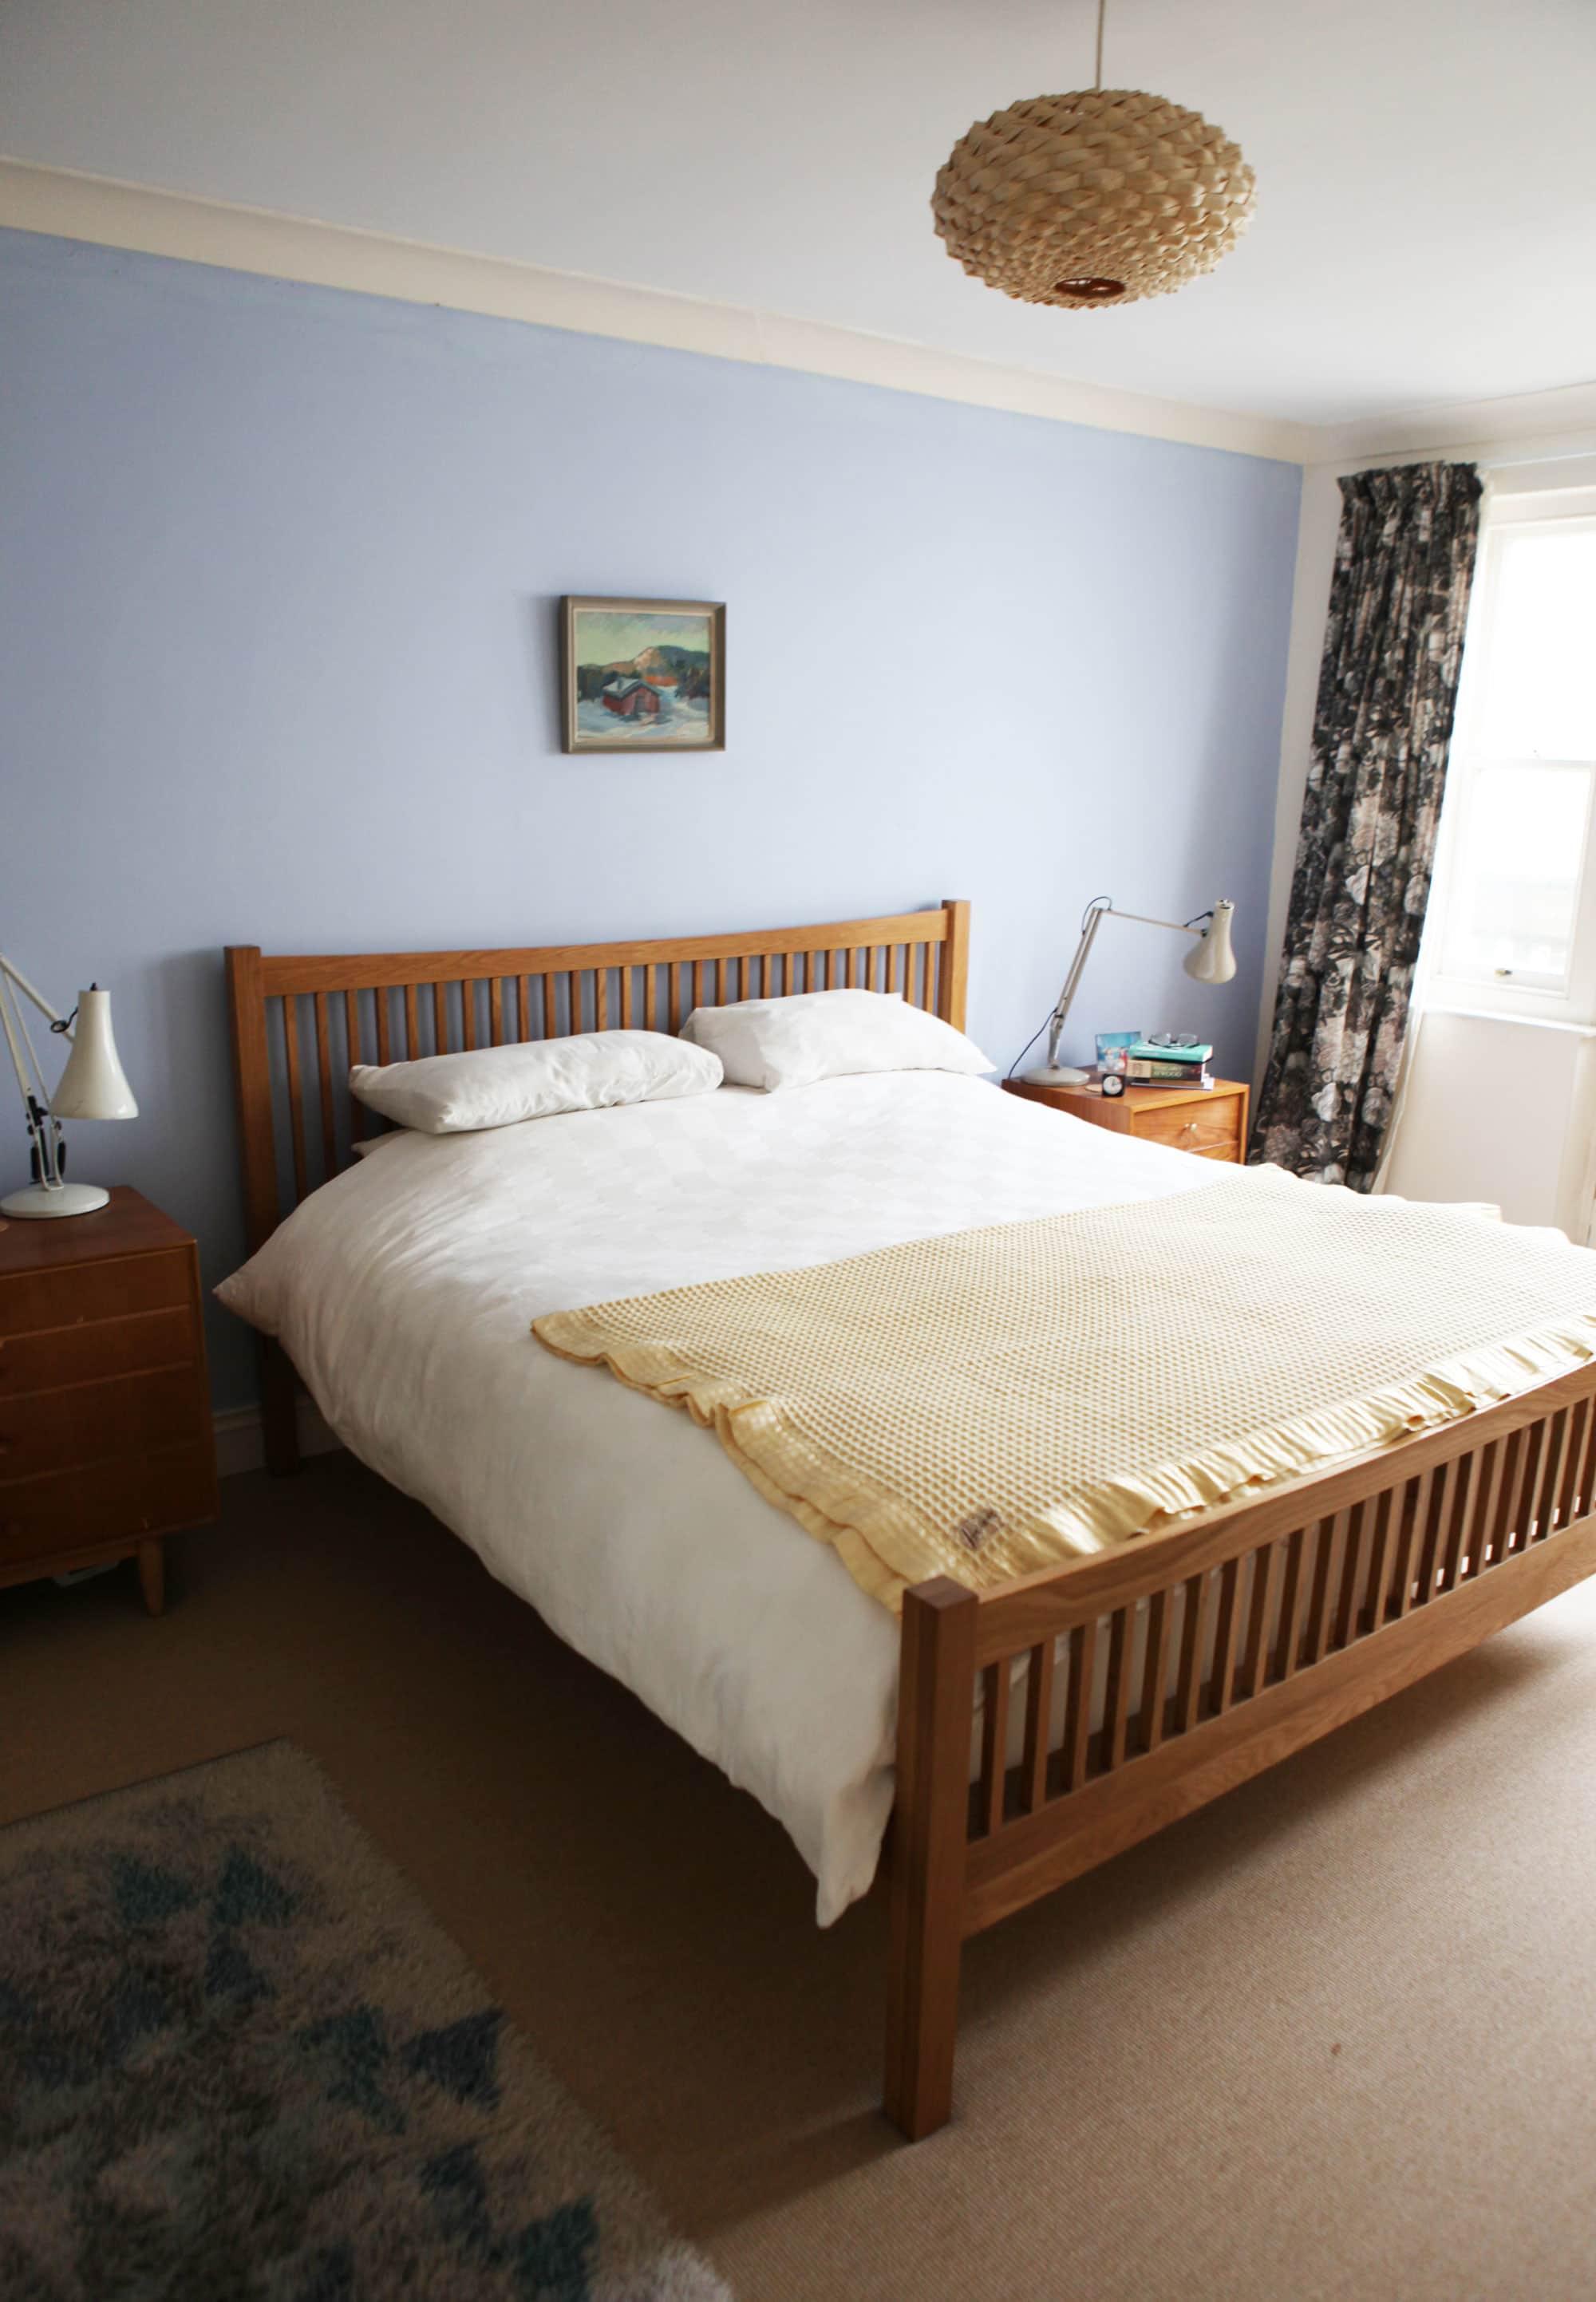 Lesley's Cozy Cool UK Coastal Home: gallery image 19